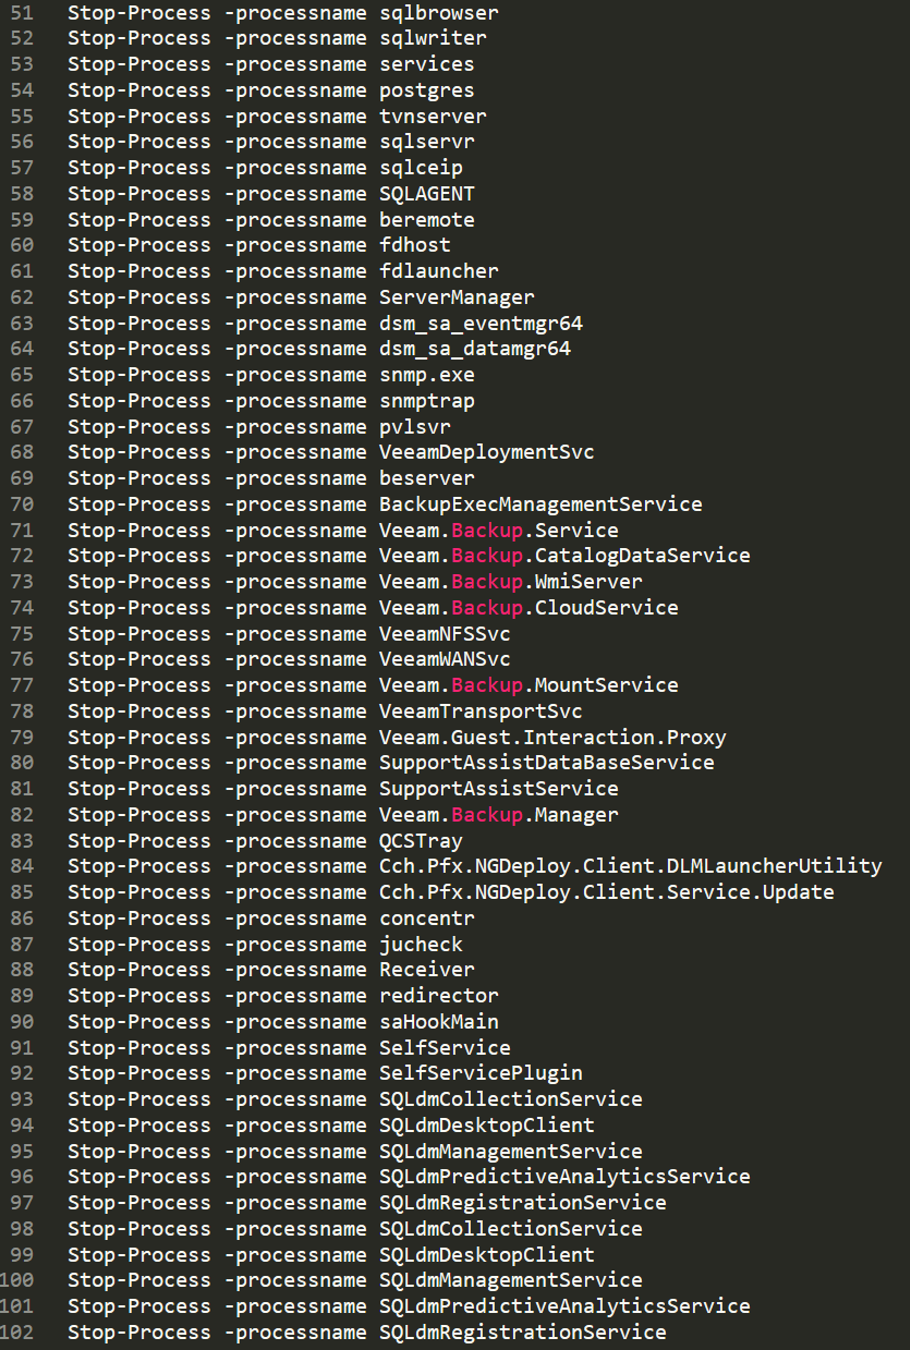 Database processes